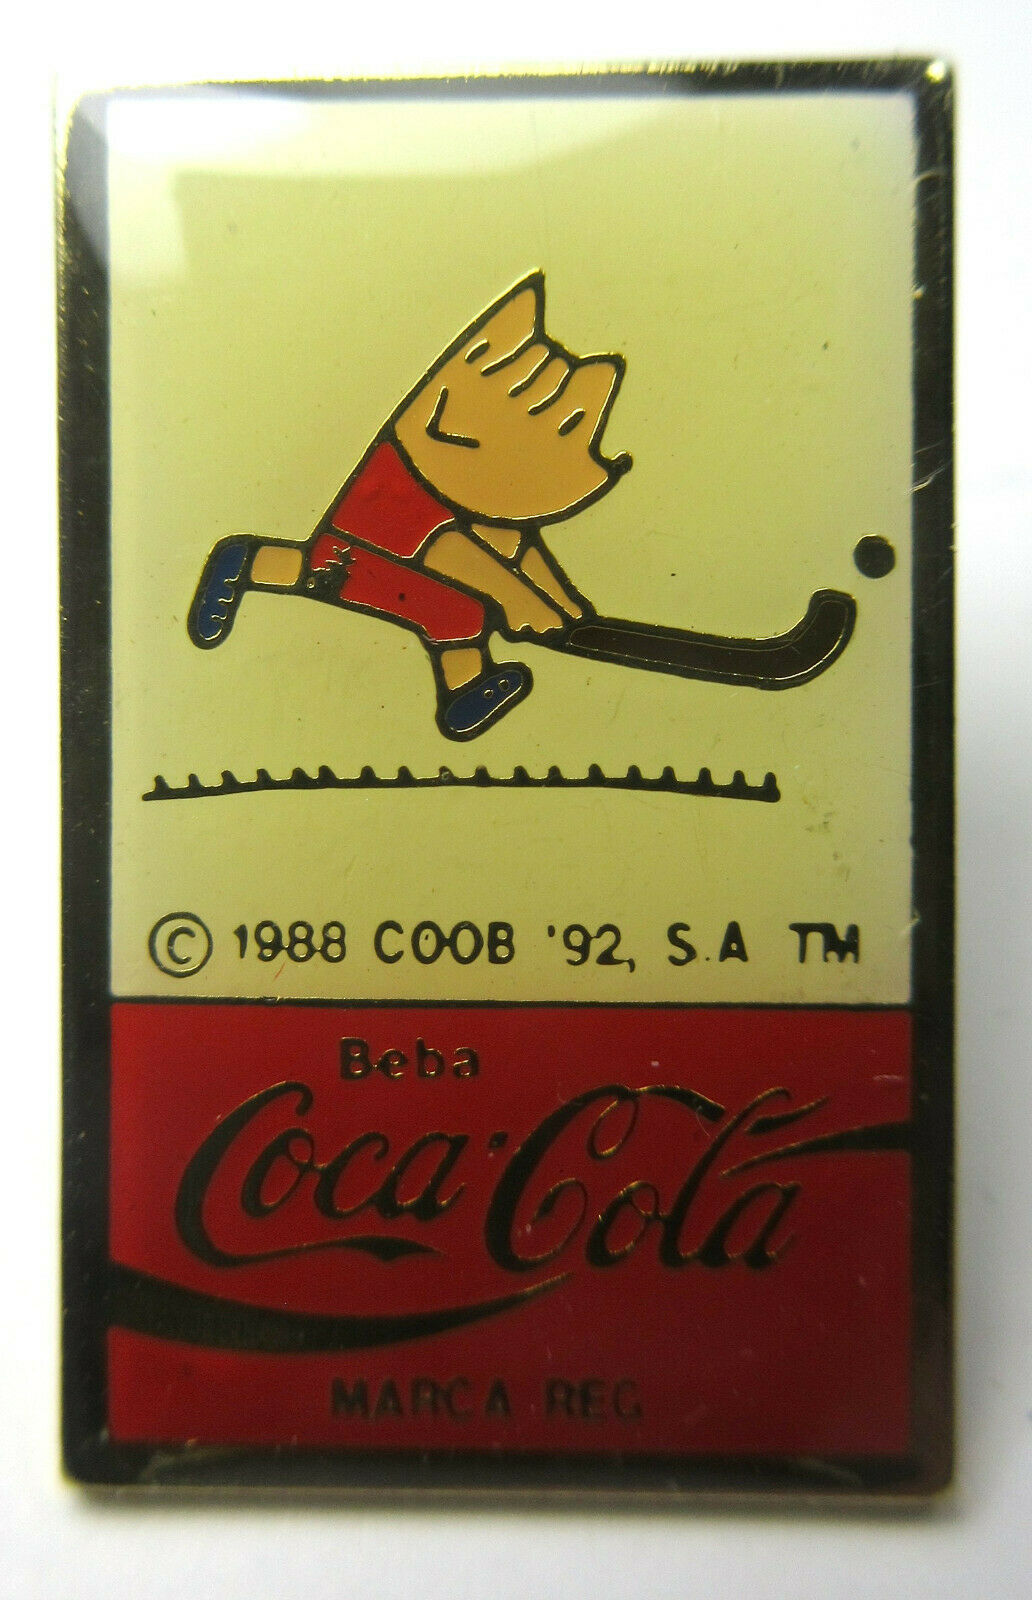 Vintage Coca Cola Coke Beba Barcelona 1992 Olympics Lapel Pins Track, Swimming image 6